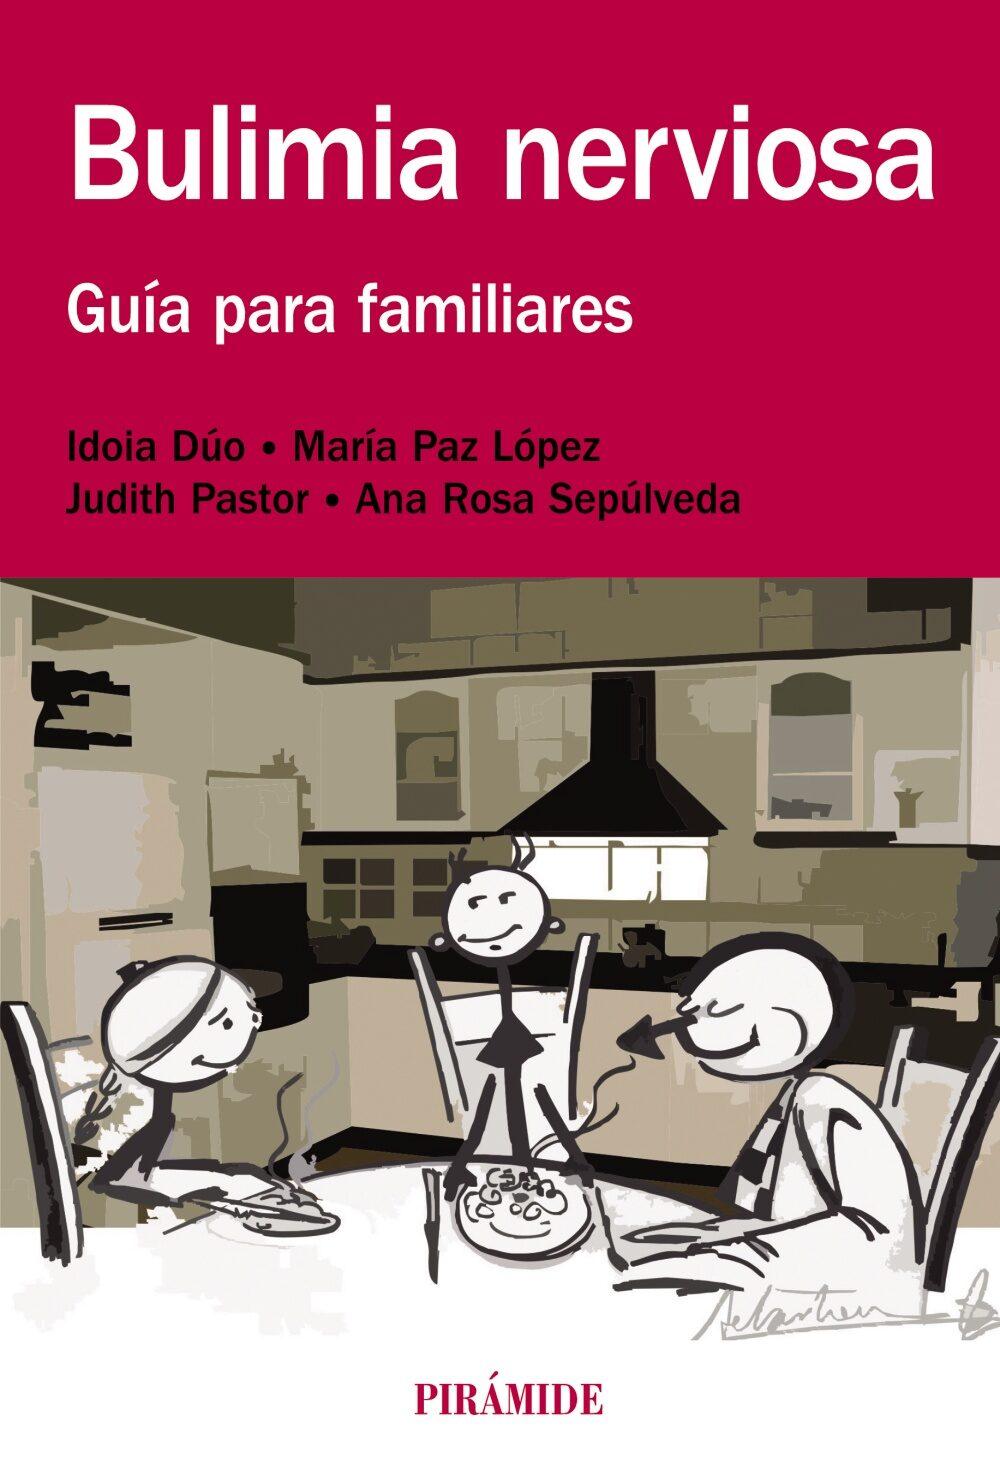 Bulimia Nerviosa: Guia Para Familiares por Idoia Duo;                                                                                                                                                                                                          Pastor